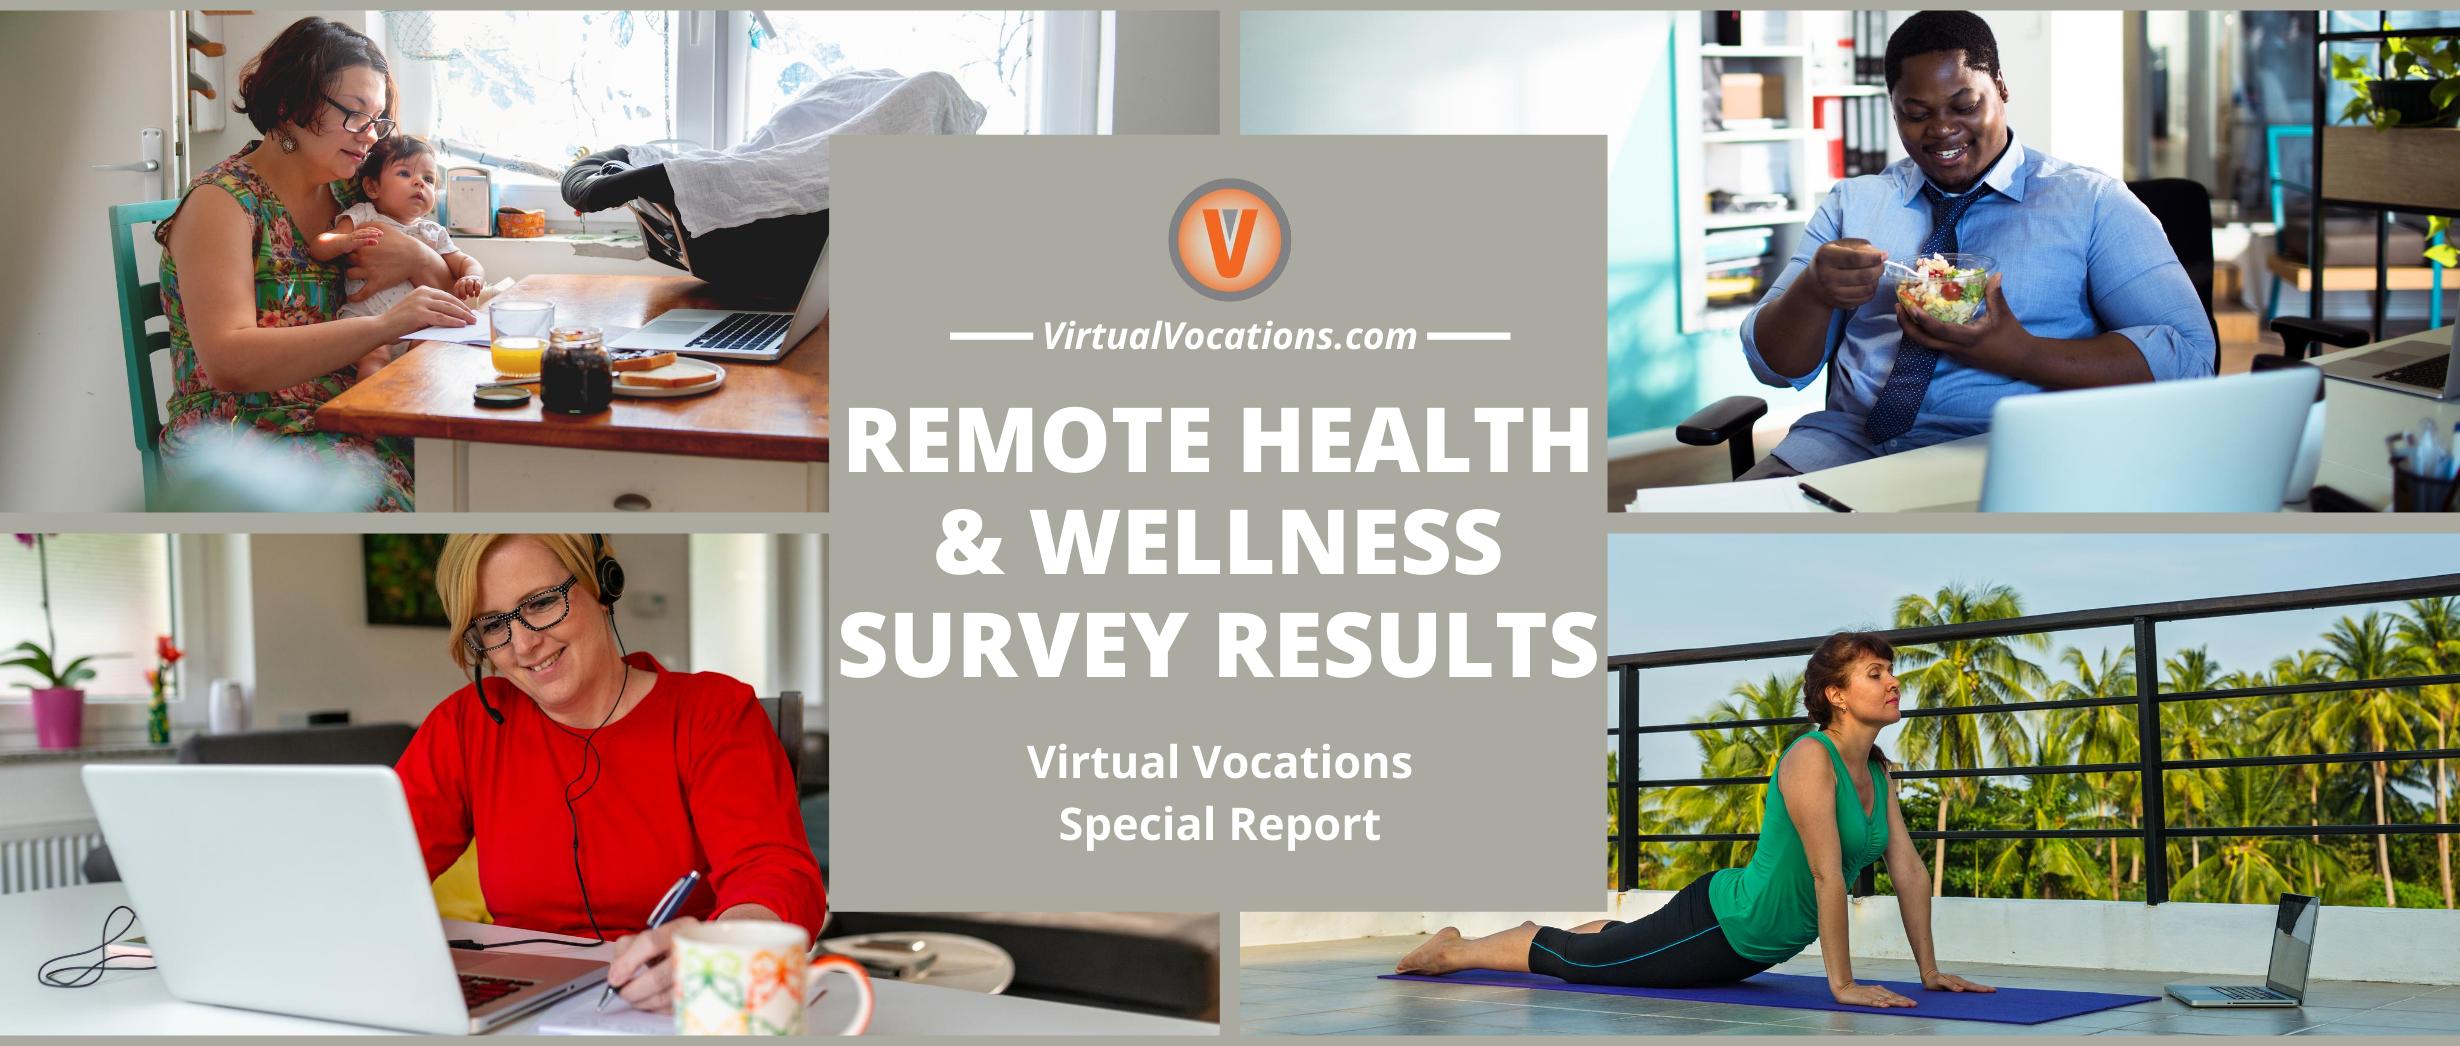 Virtual Vocations - Remote Health and Wellness Survey